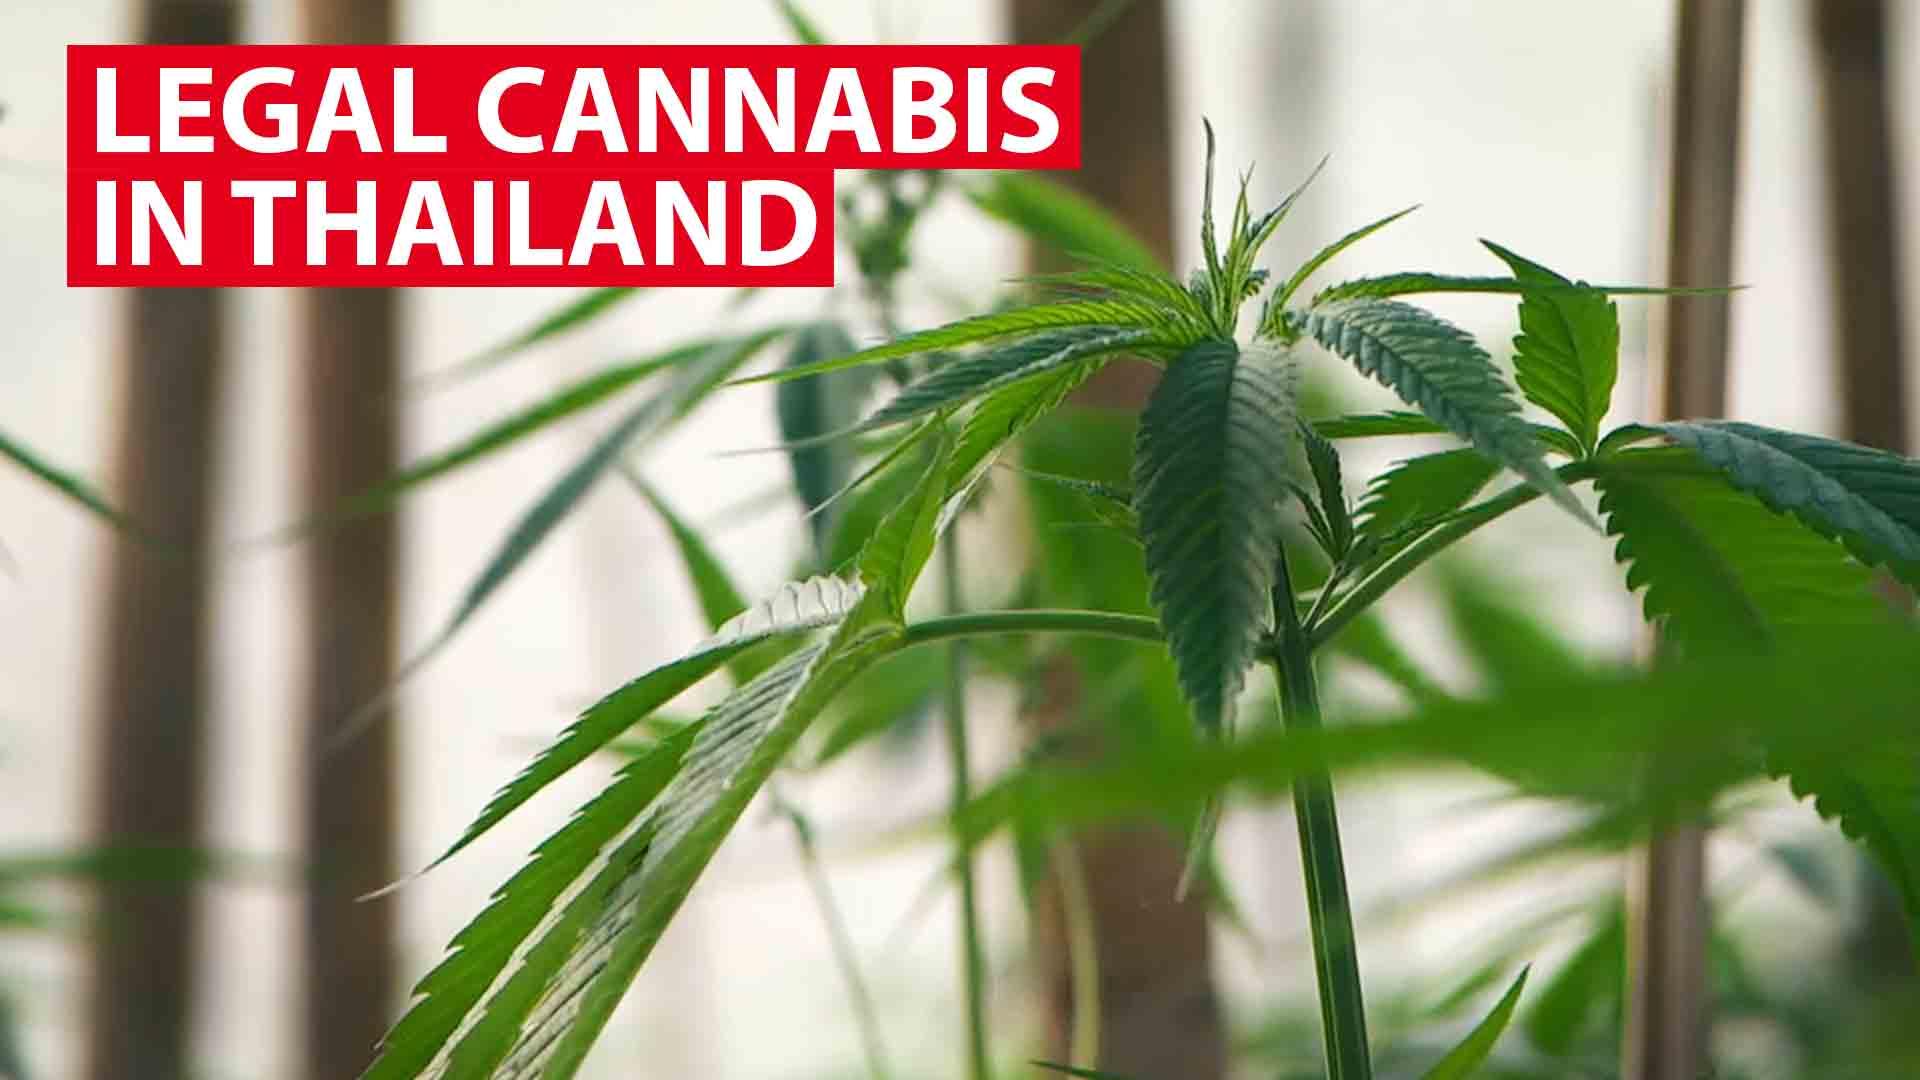 Inside Thailand's first legalised cannabis plantation